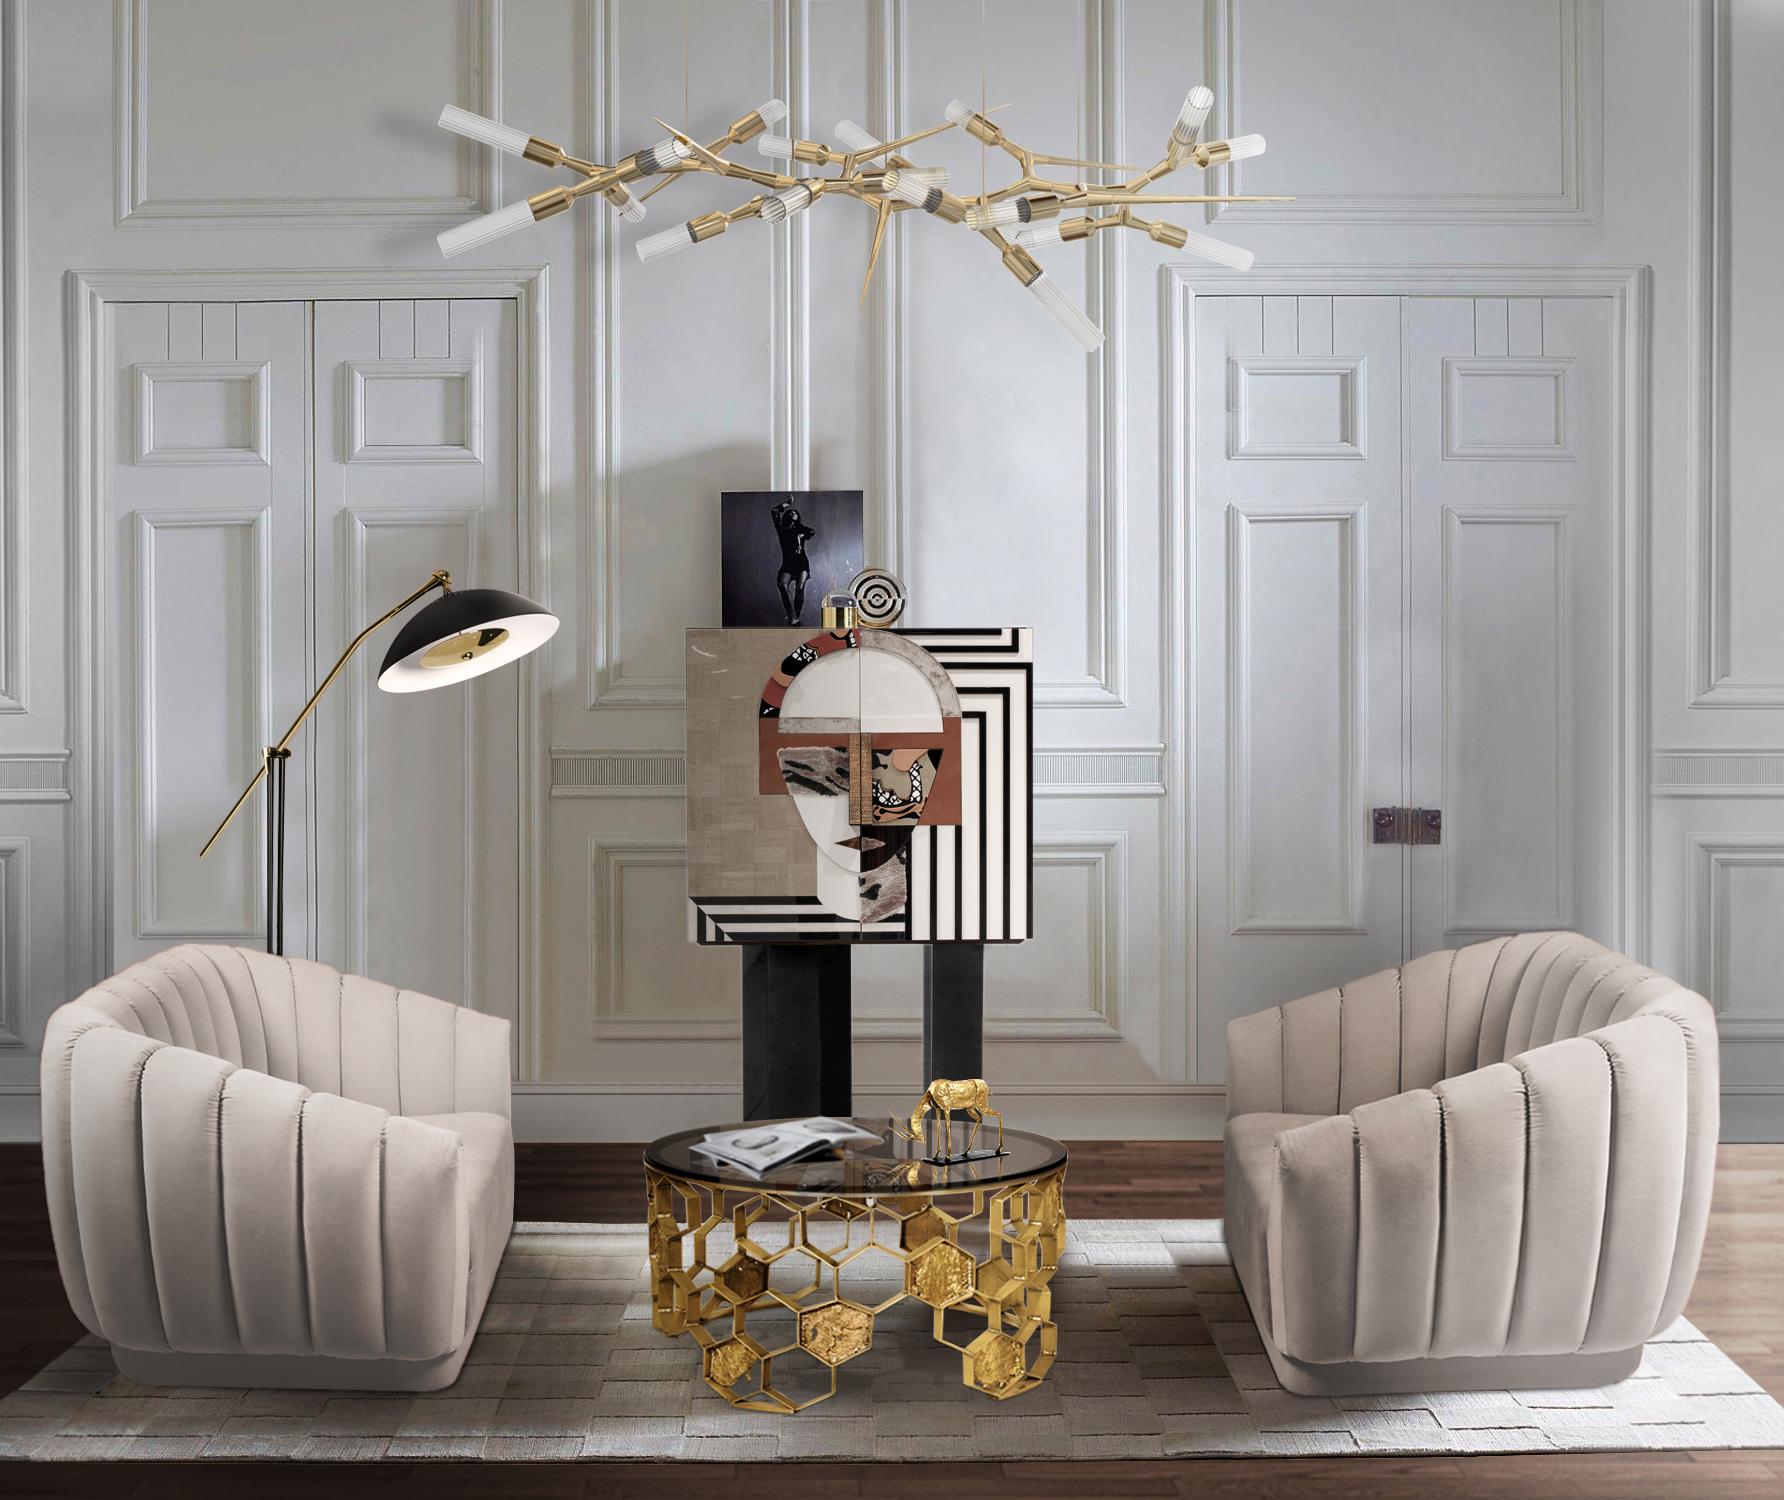 5 Minimalistic Living Room Sets That Will Make You Curl Up In All Fall! living room 5 Minimalistic Living Room Sets That Will Make You Curl Up In All Fall! 1 3